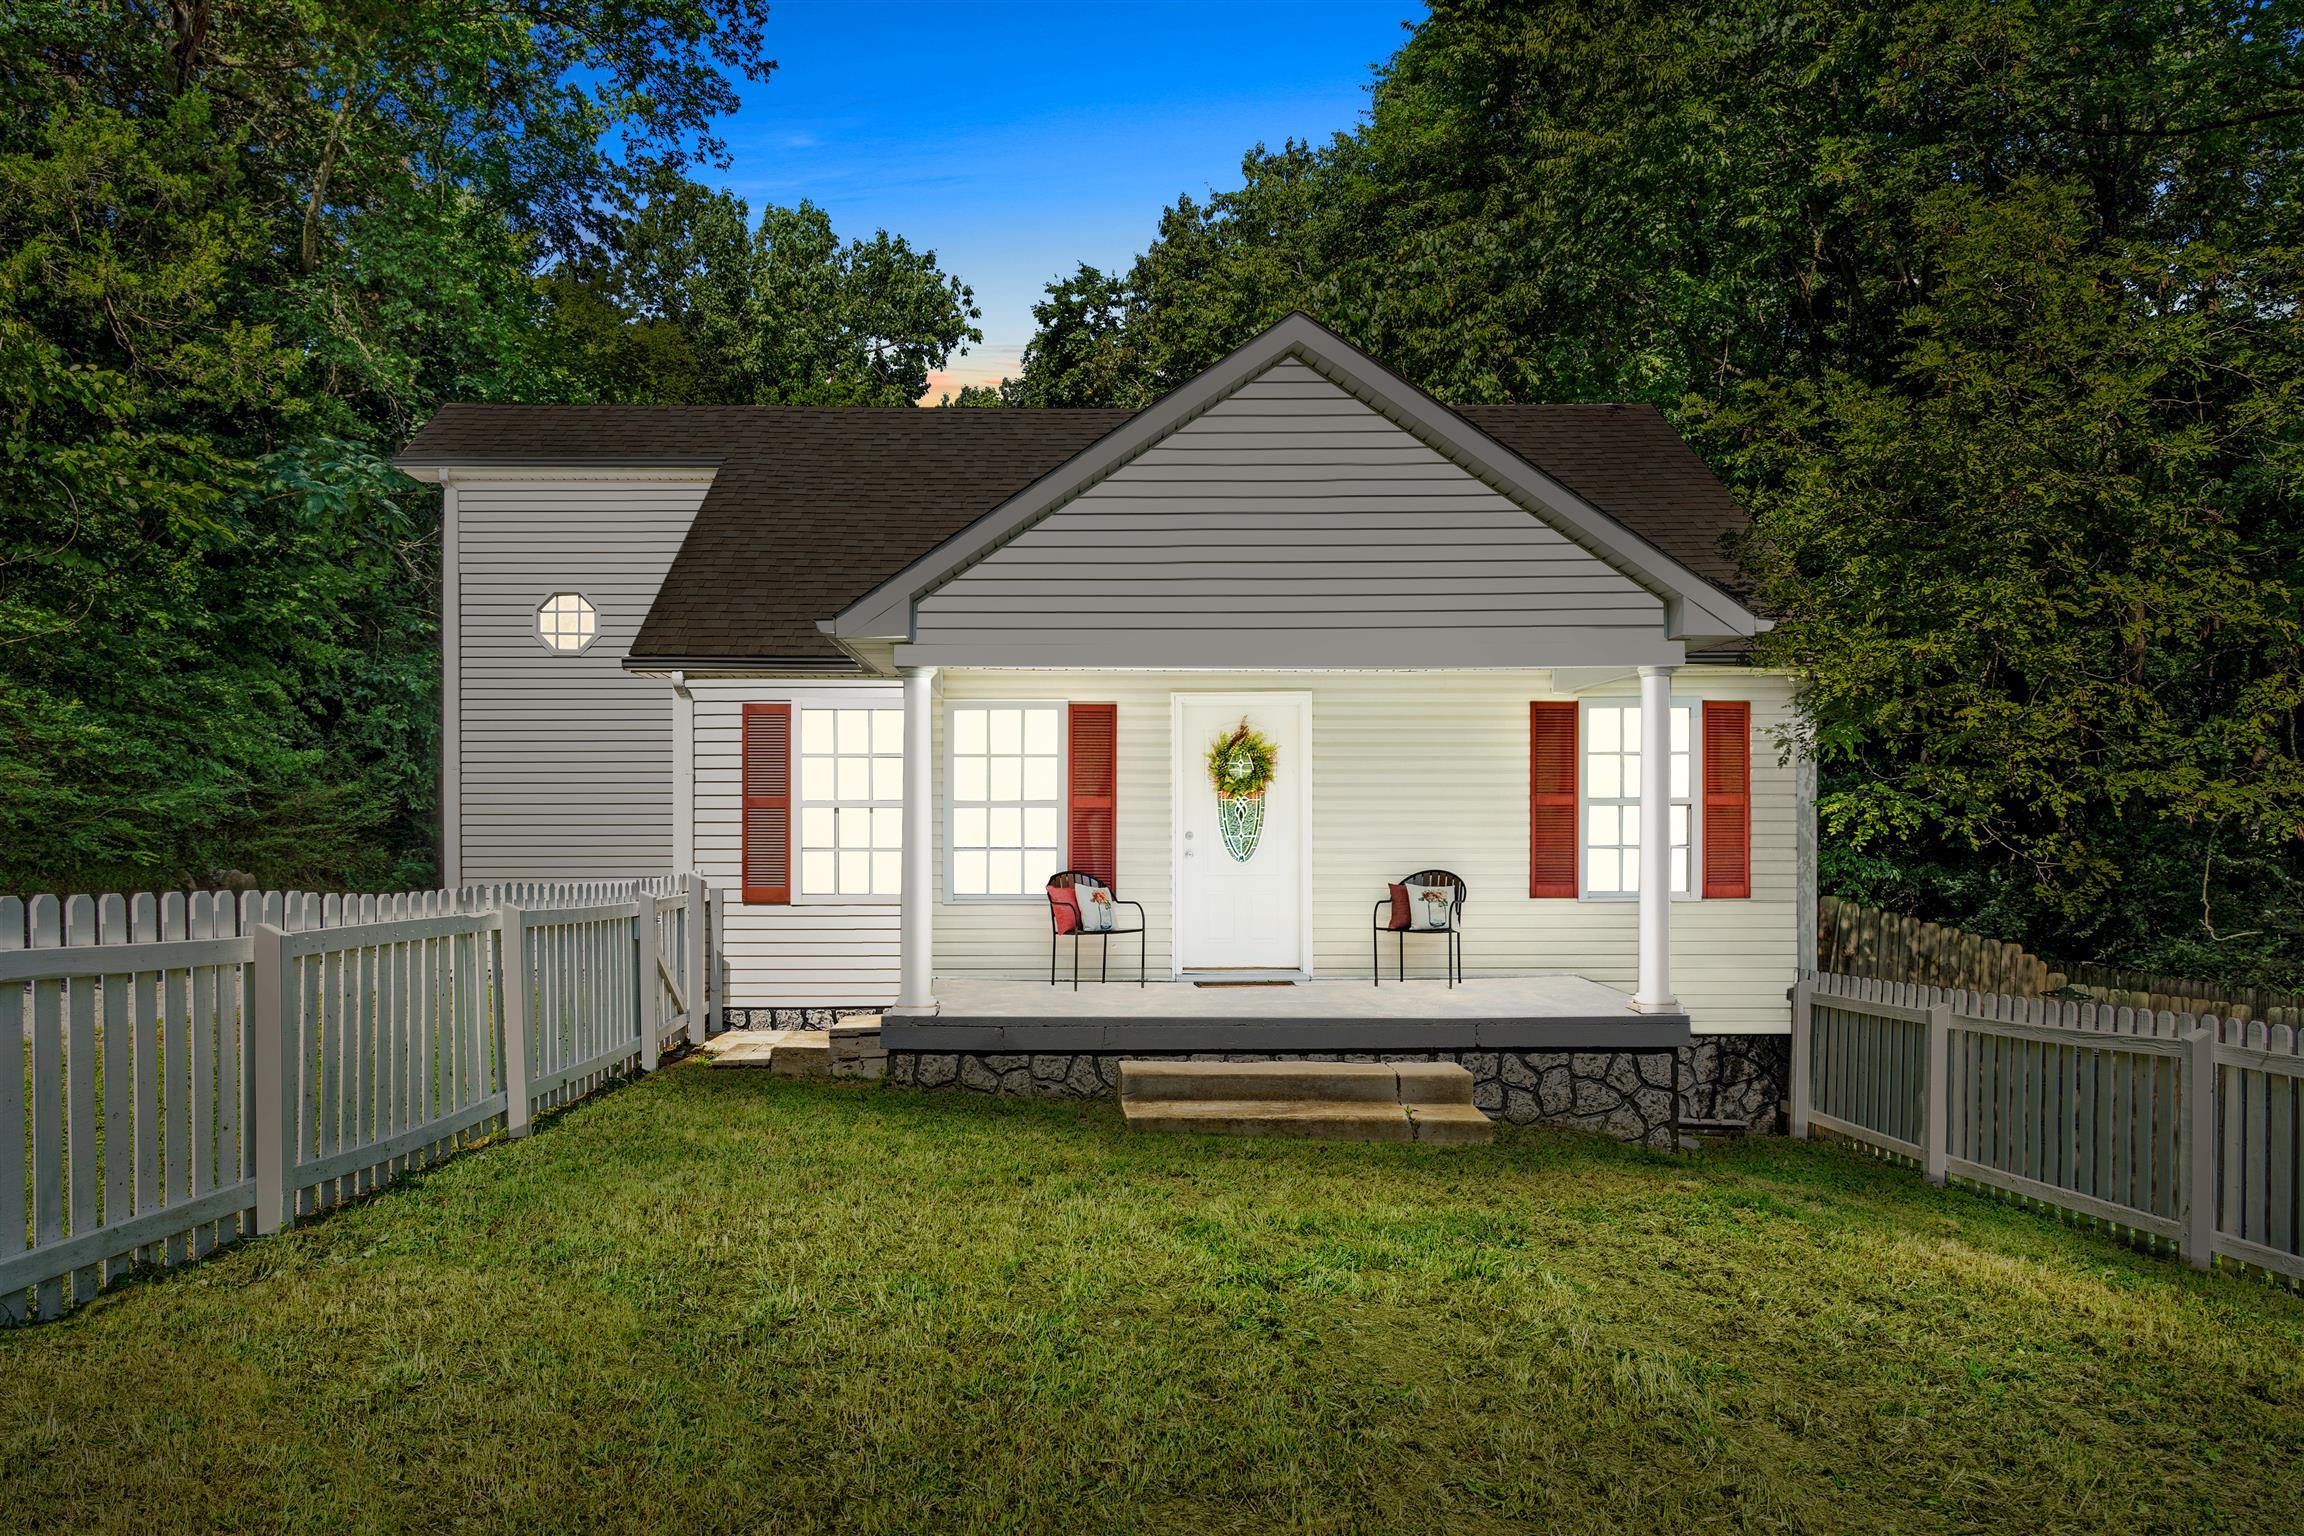 213 Cave Street, Clarksville, TN 37042 - Clarksville, TN real estate listing